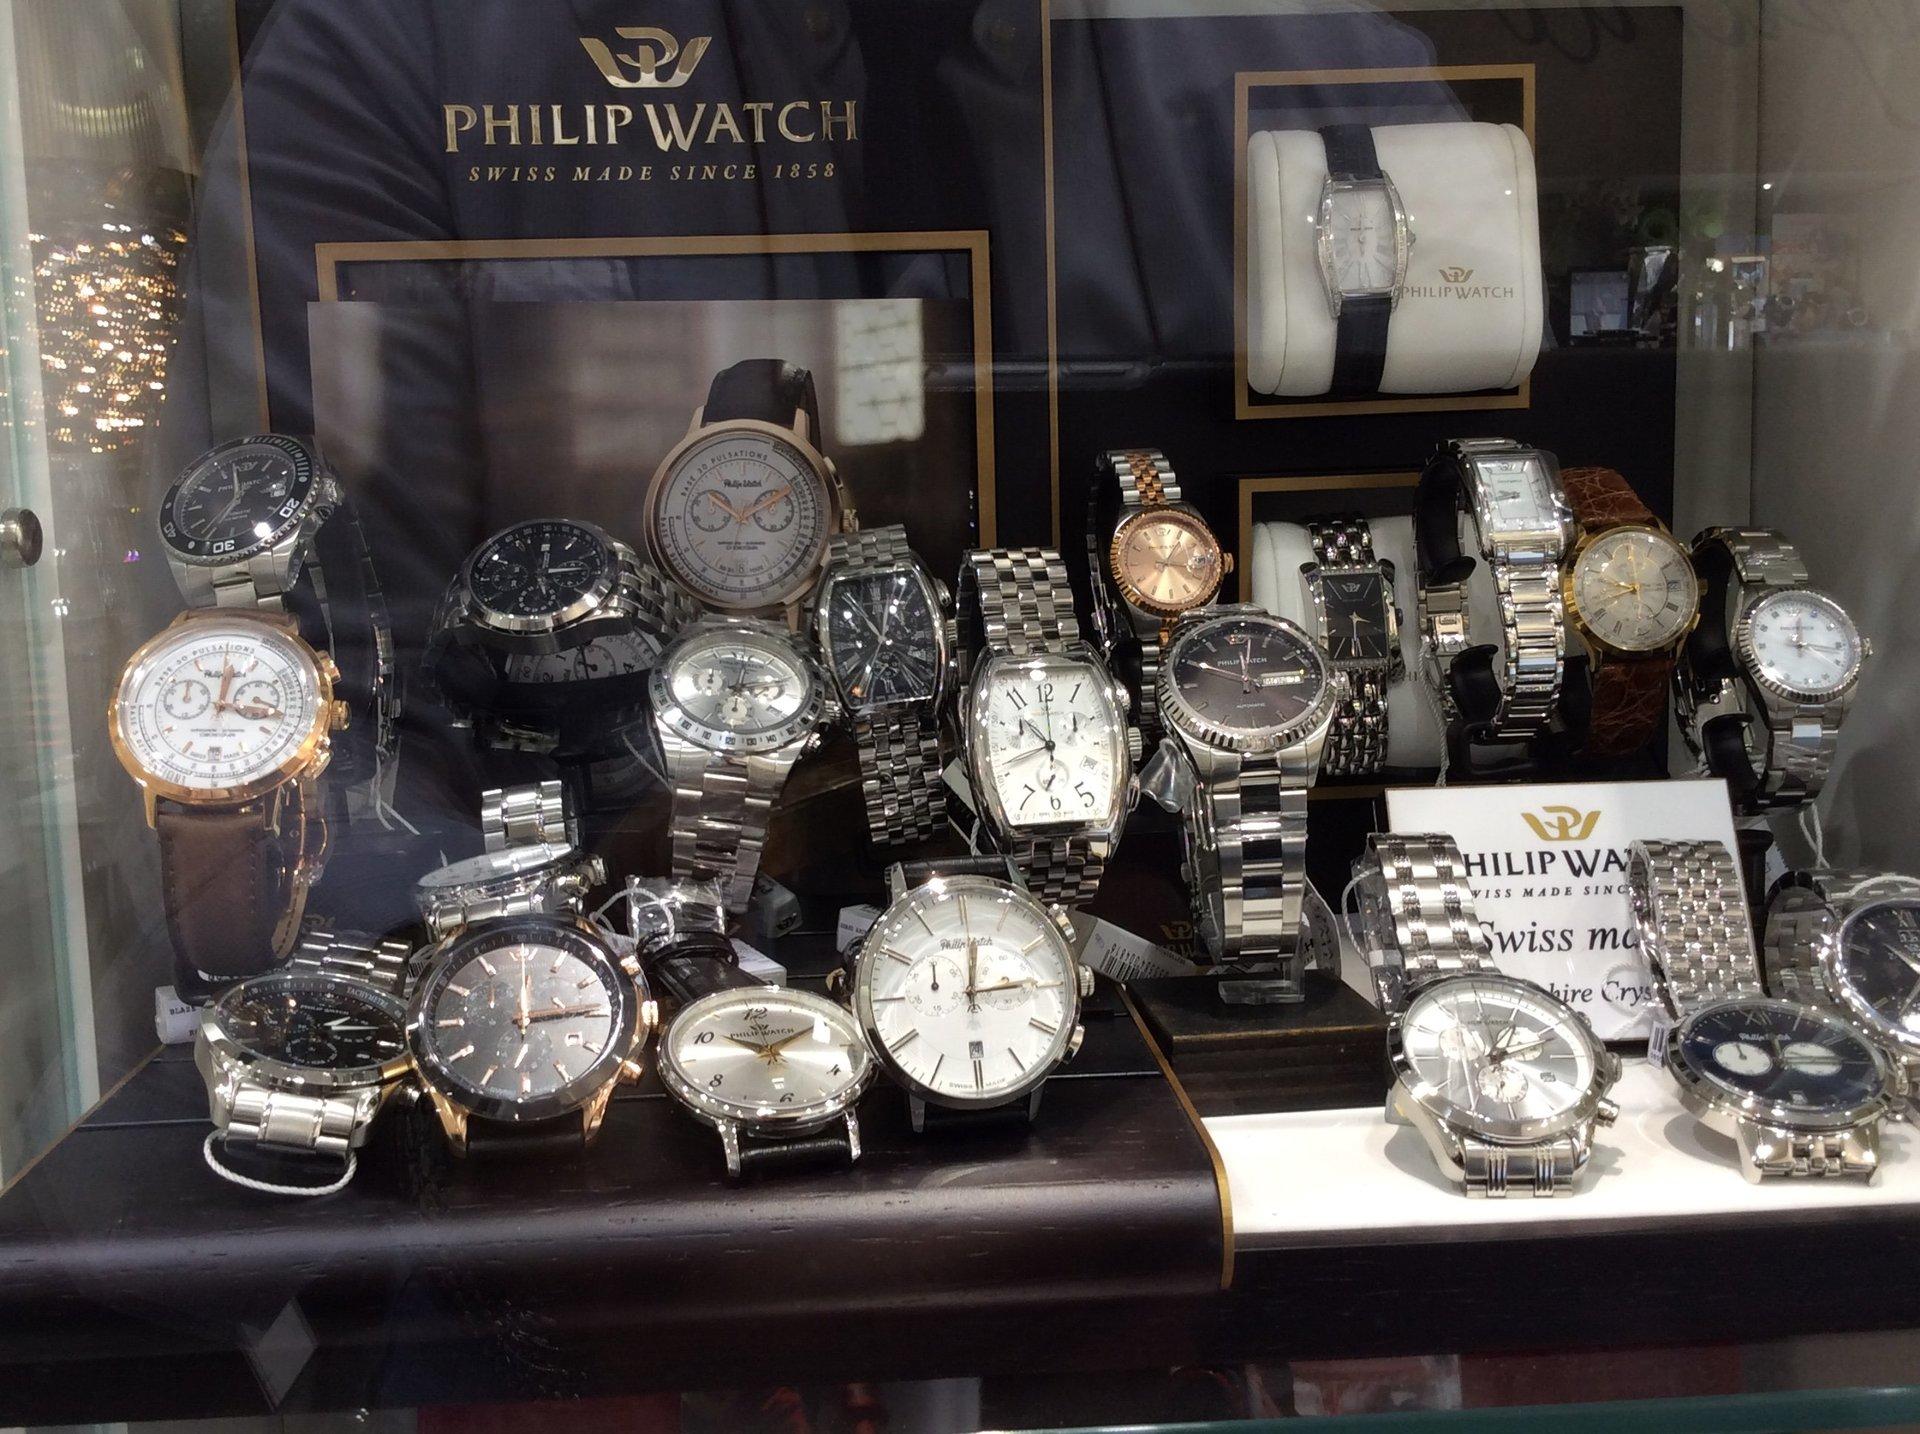 Esposizione orologi Philip Watch